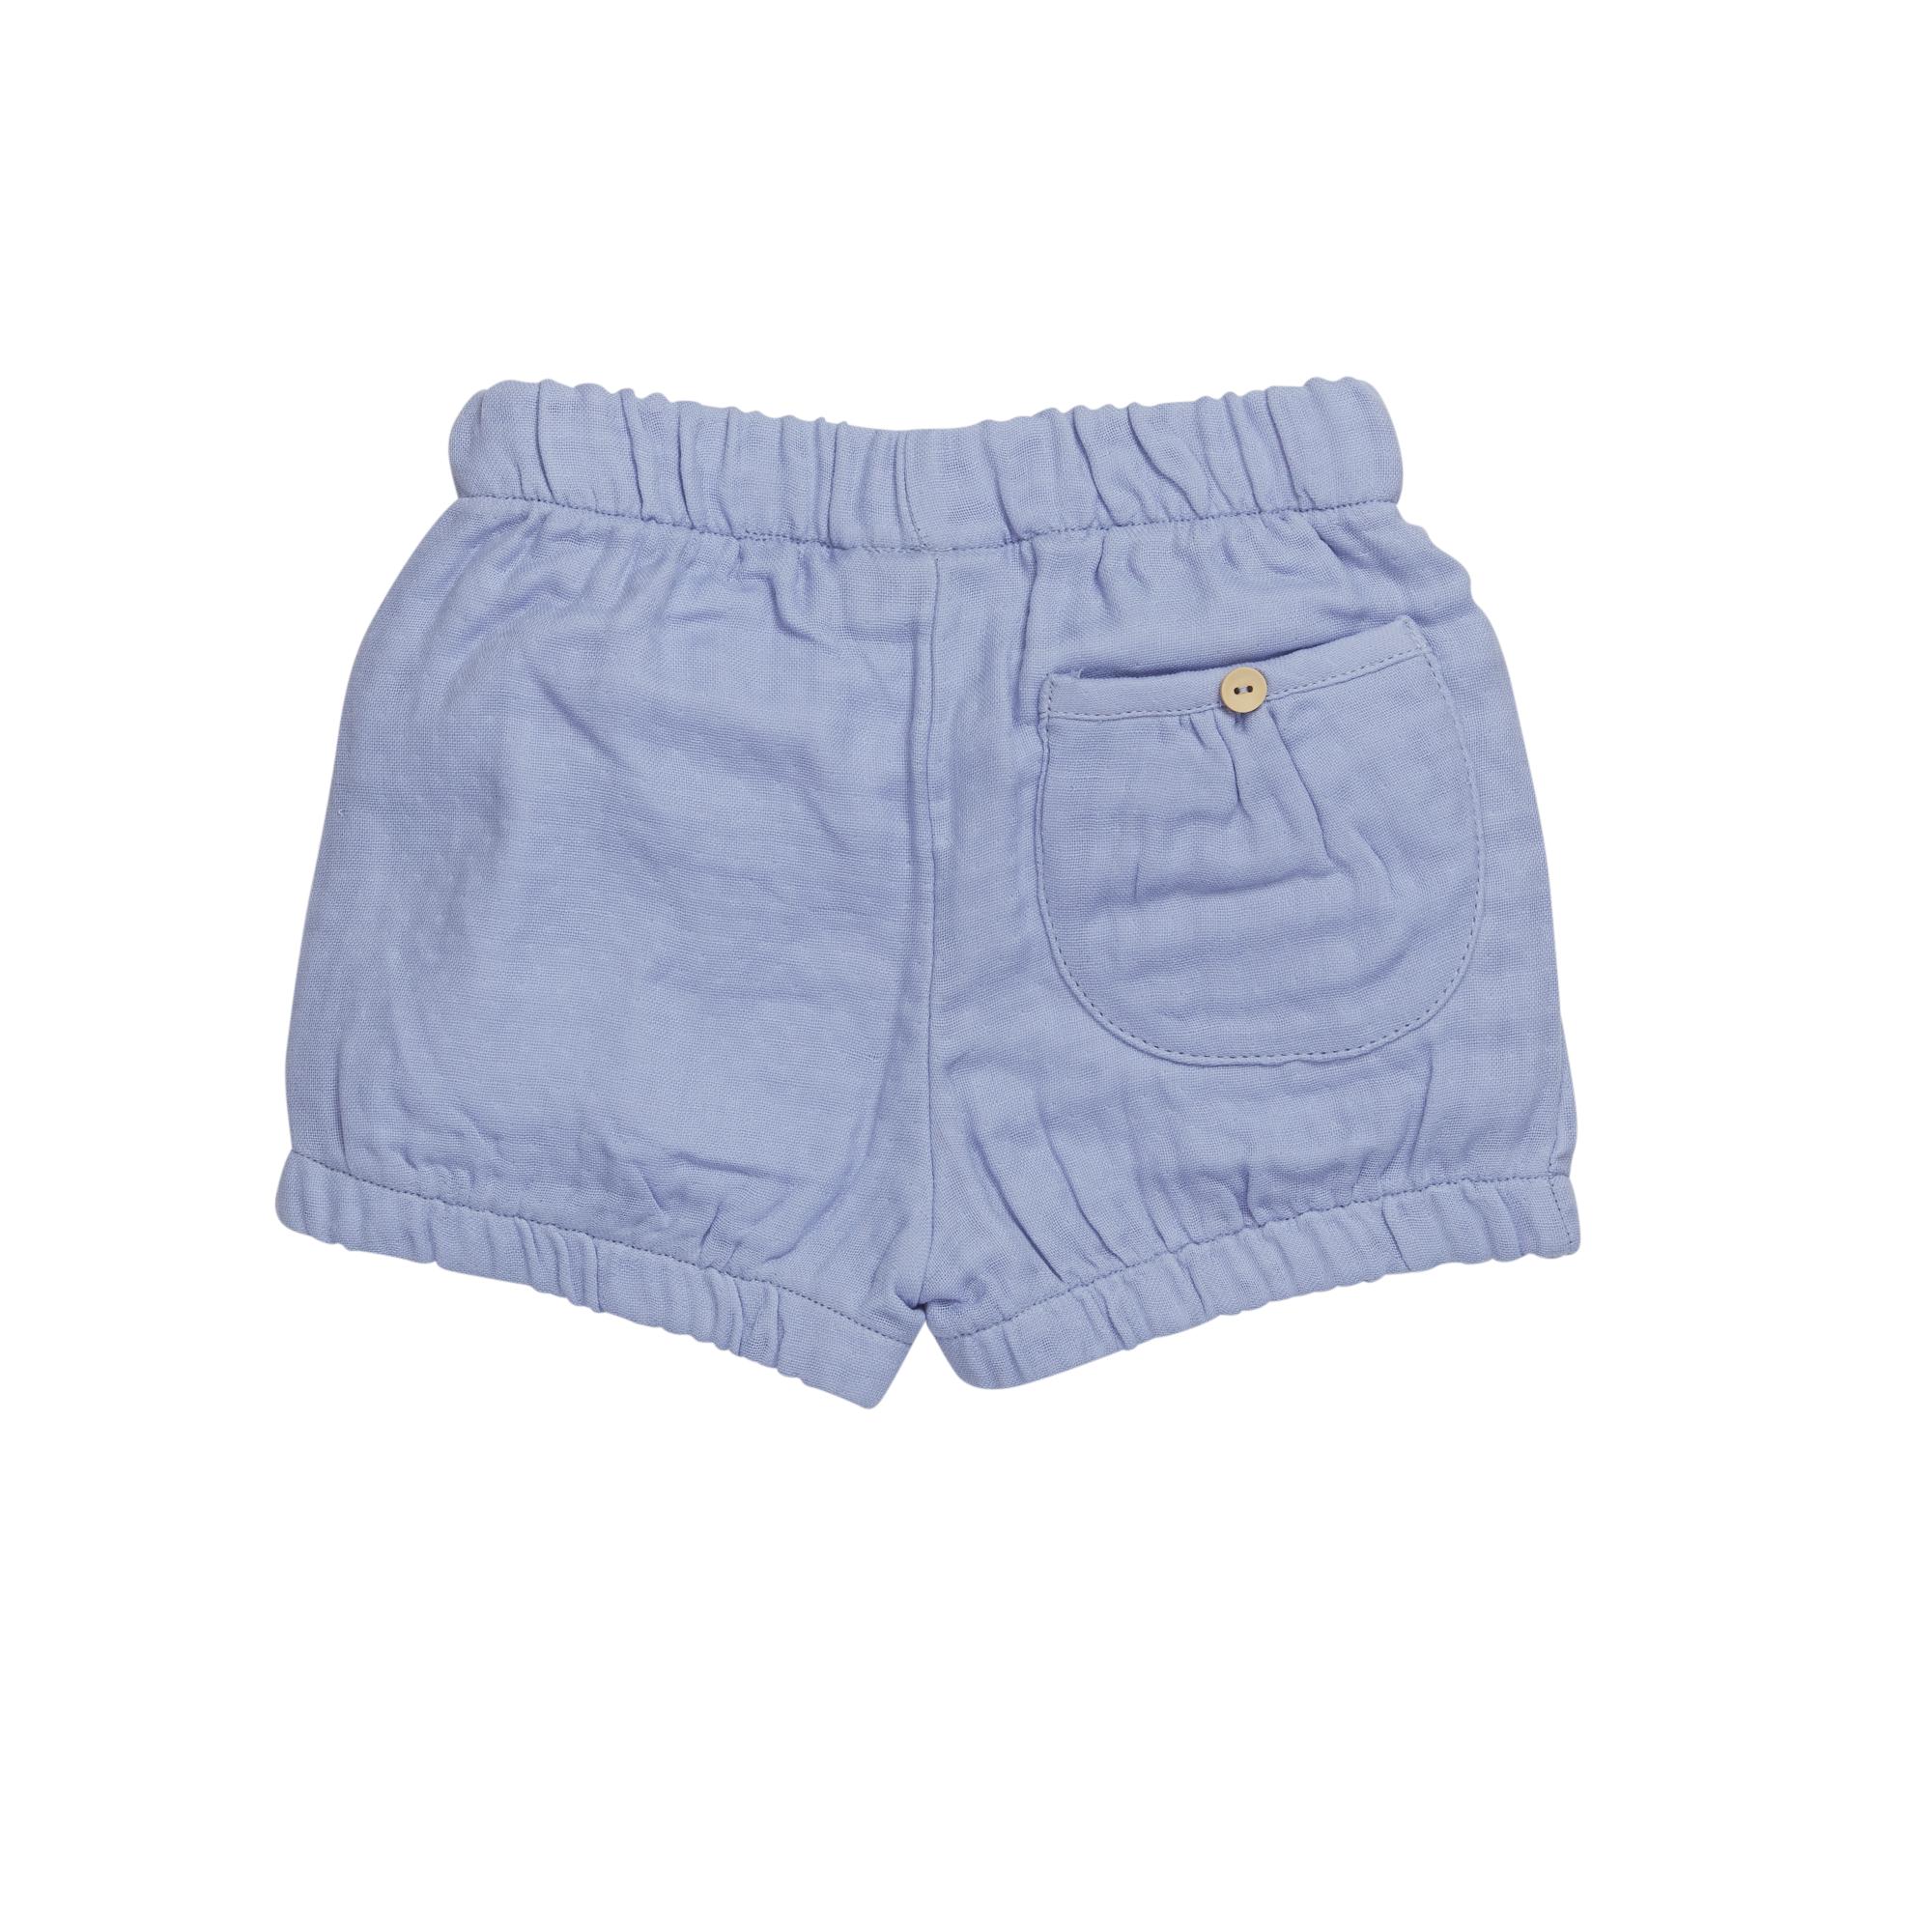 Shorts muslin - Lilac Blue-3